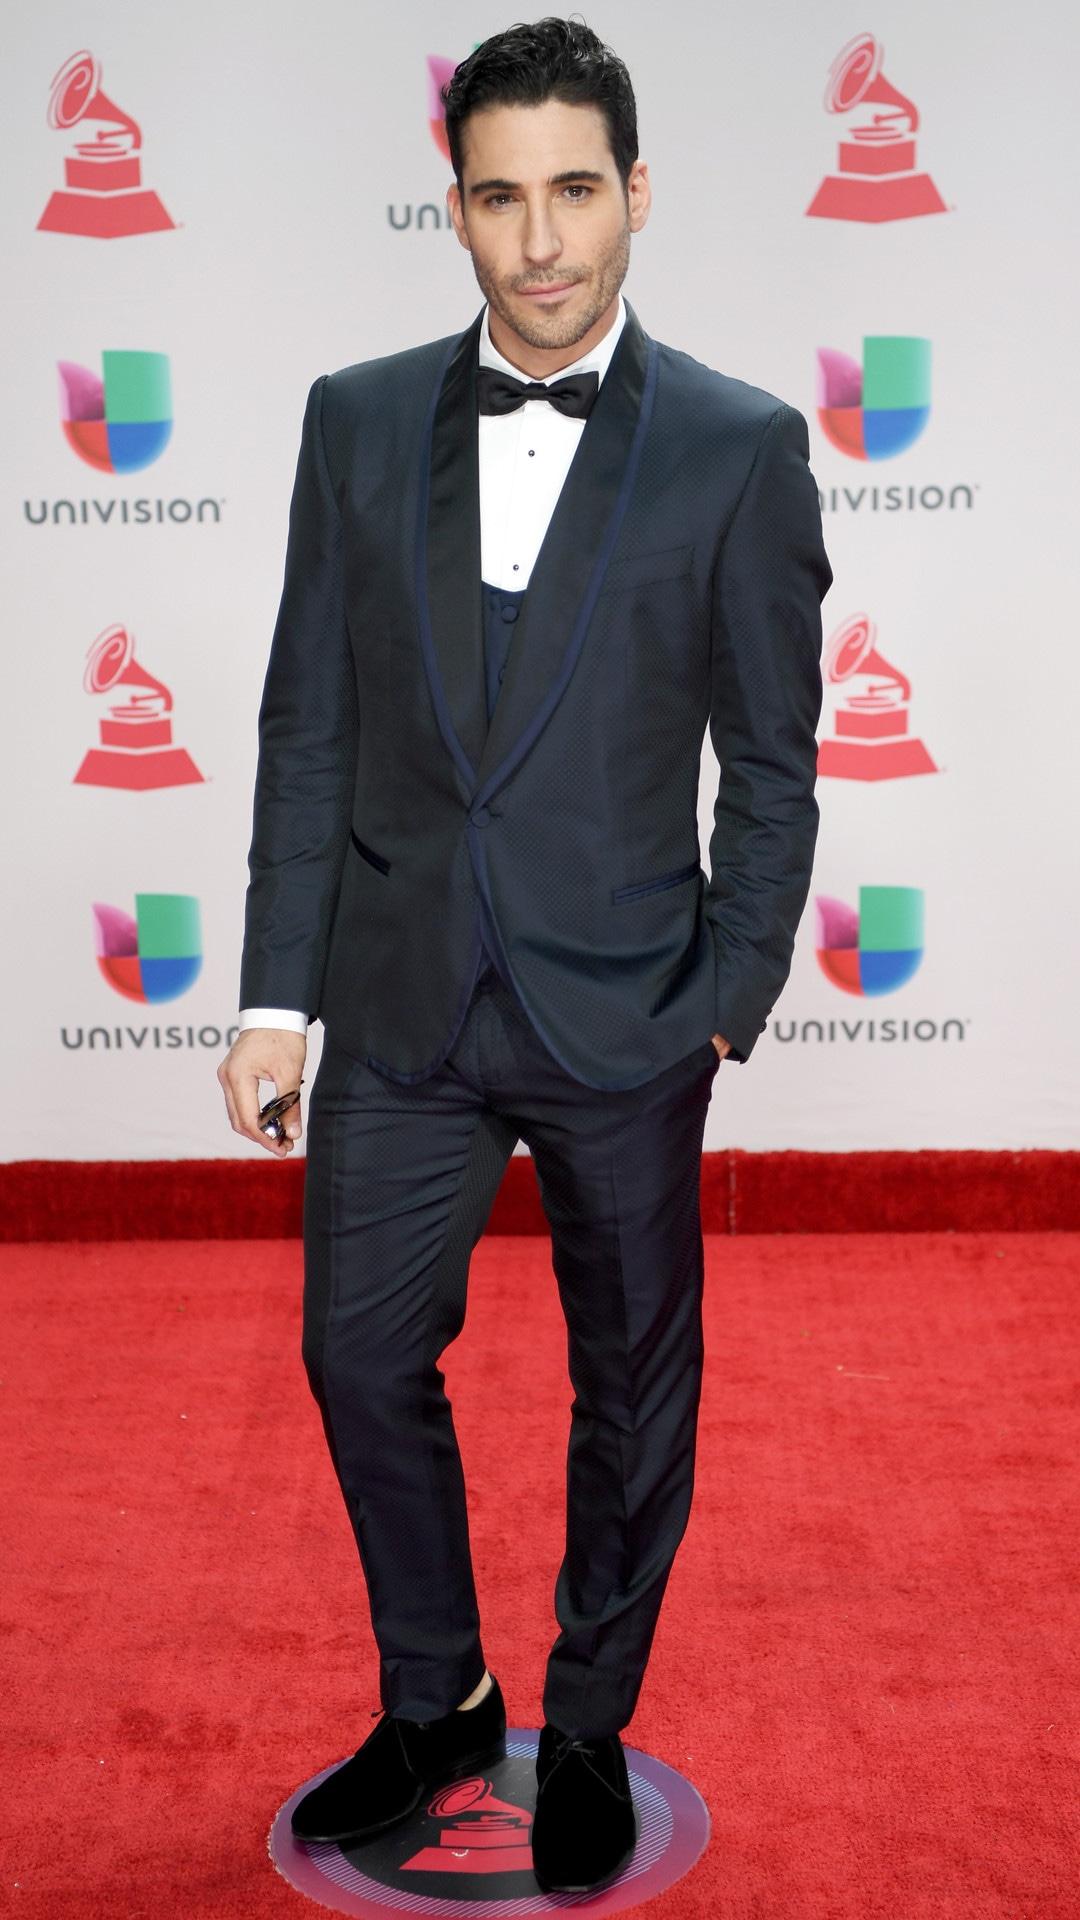 Miguel Angel Silvestre, 2017 Latin Grammy Awards